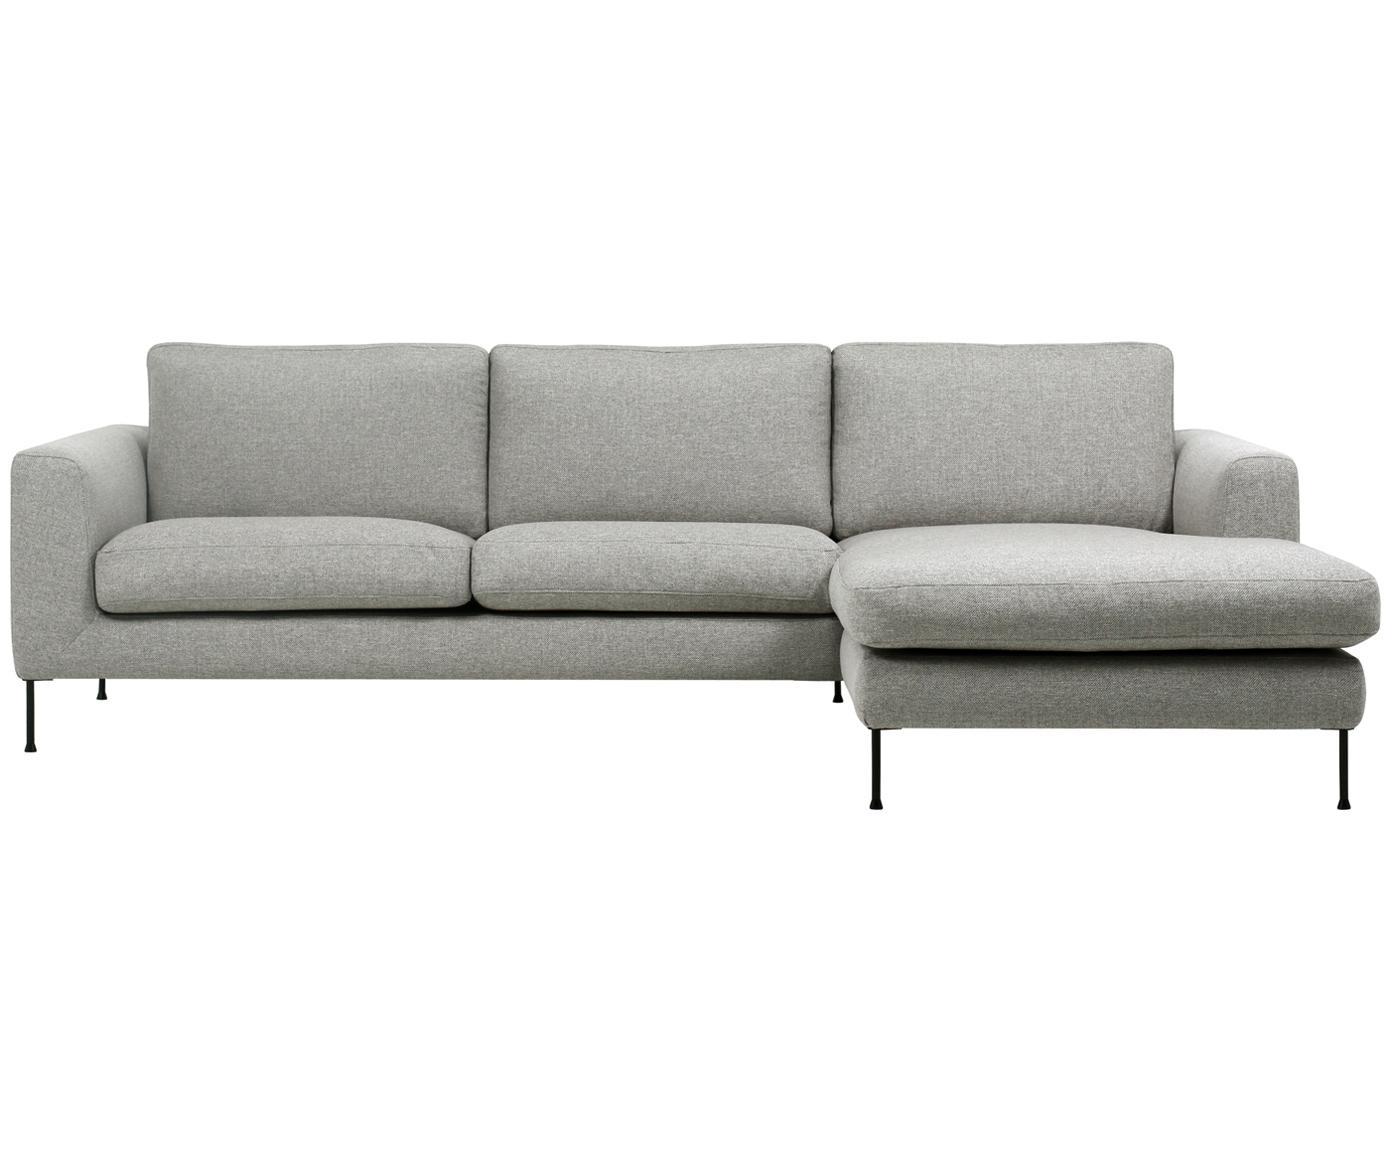 Sofá rinconero Cucita (3plazas), Tapizado: tejido (poliéster) 45.000, Estructura: madera de pino maciza, Tejido gris claro, An 262 x F 163 cm